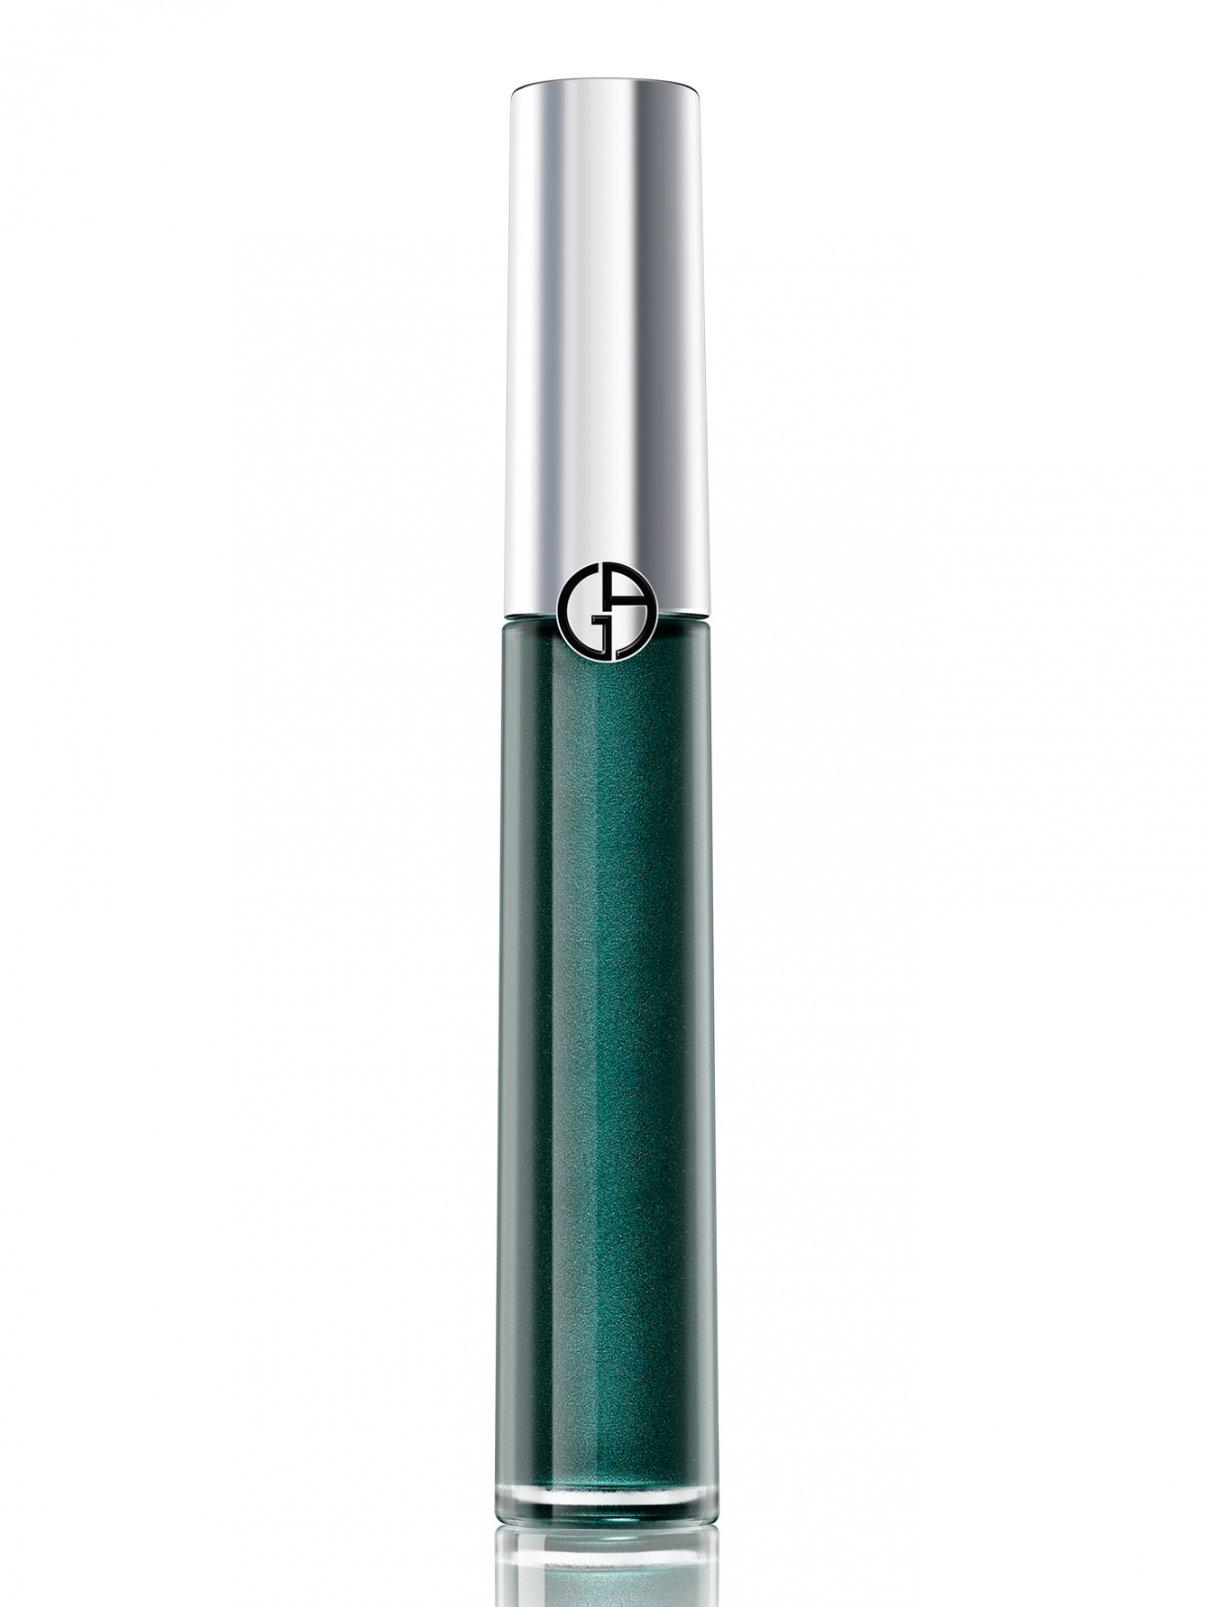 Жидкие тени для век - №4 Emeraude, Eye Tint Giorgio Armani  –  Общий вид